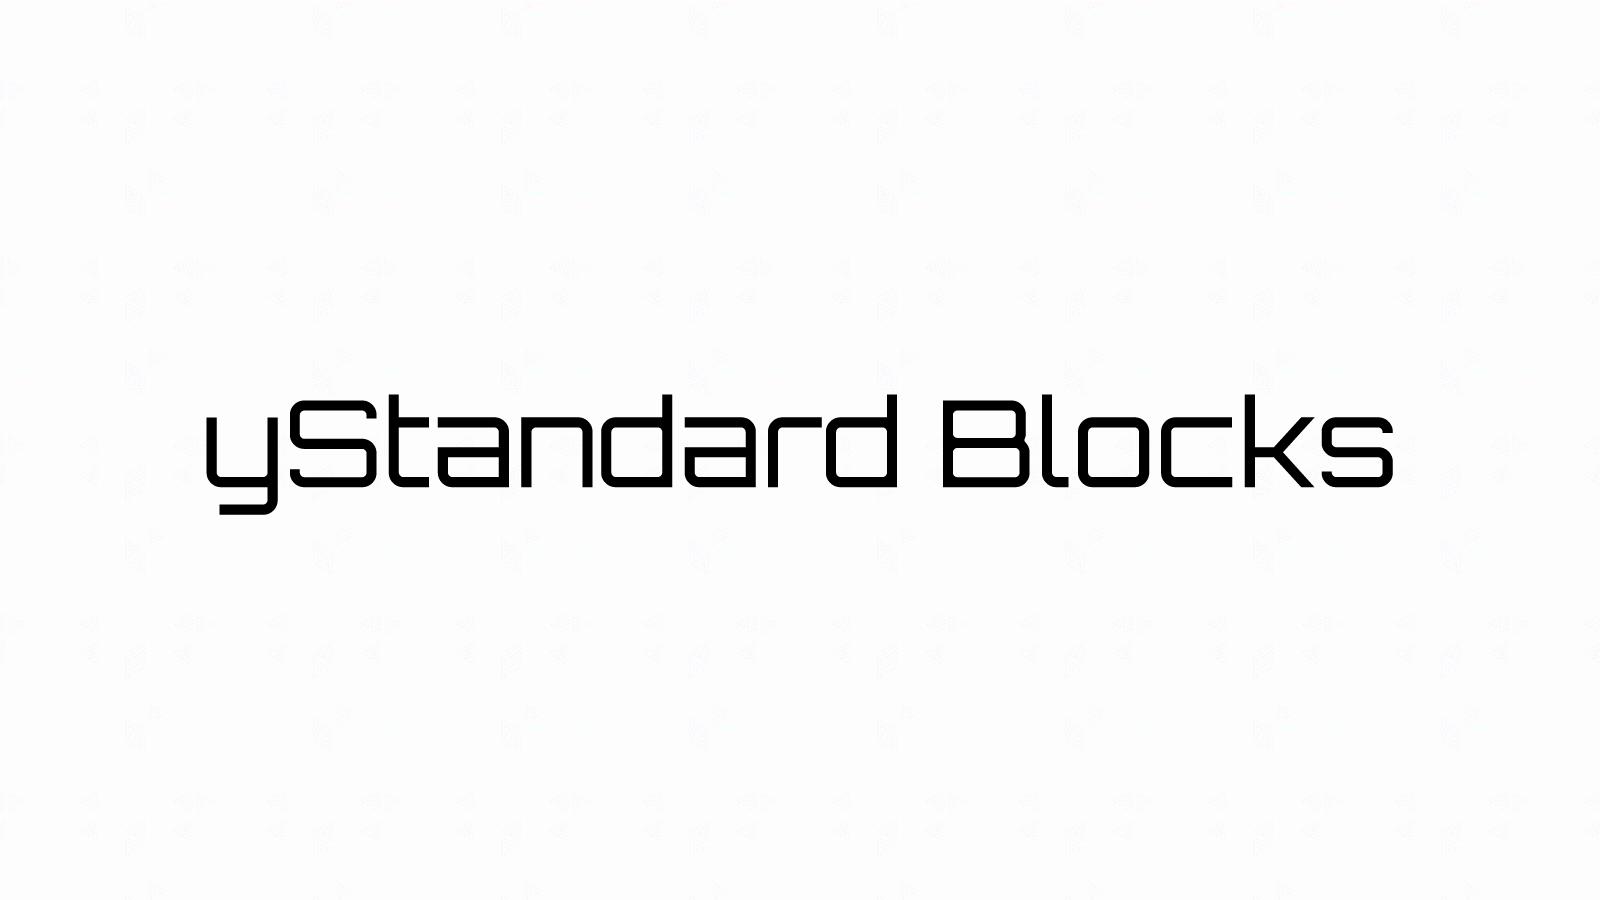 yStandard用ブロックエディター拡張プラグイン「yStandard Blocks」のβ版を公開します!